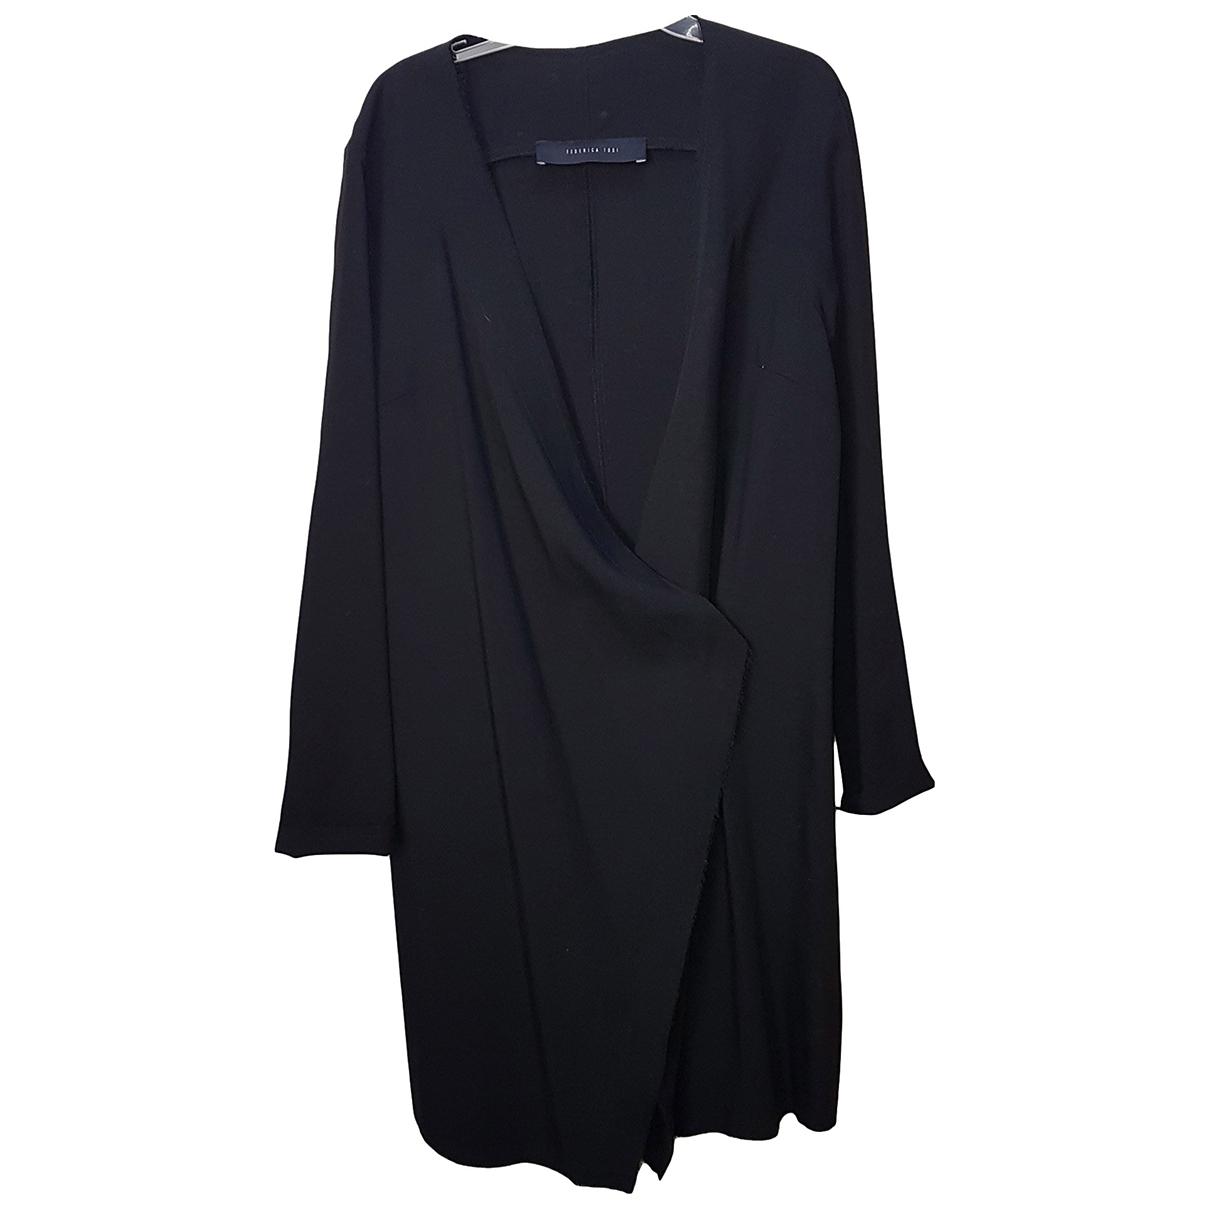 Federica Tosi \N Black Wool coat for Women 42 IT